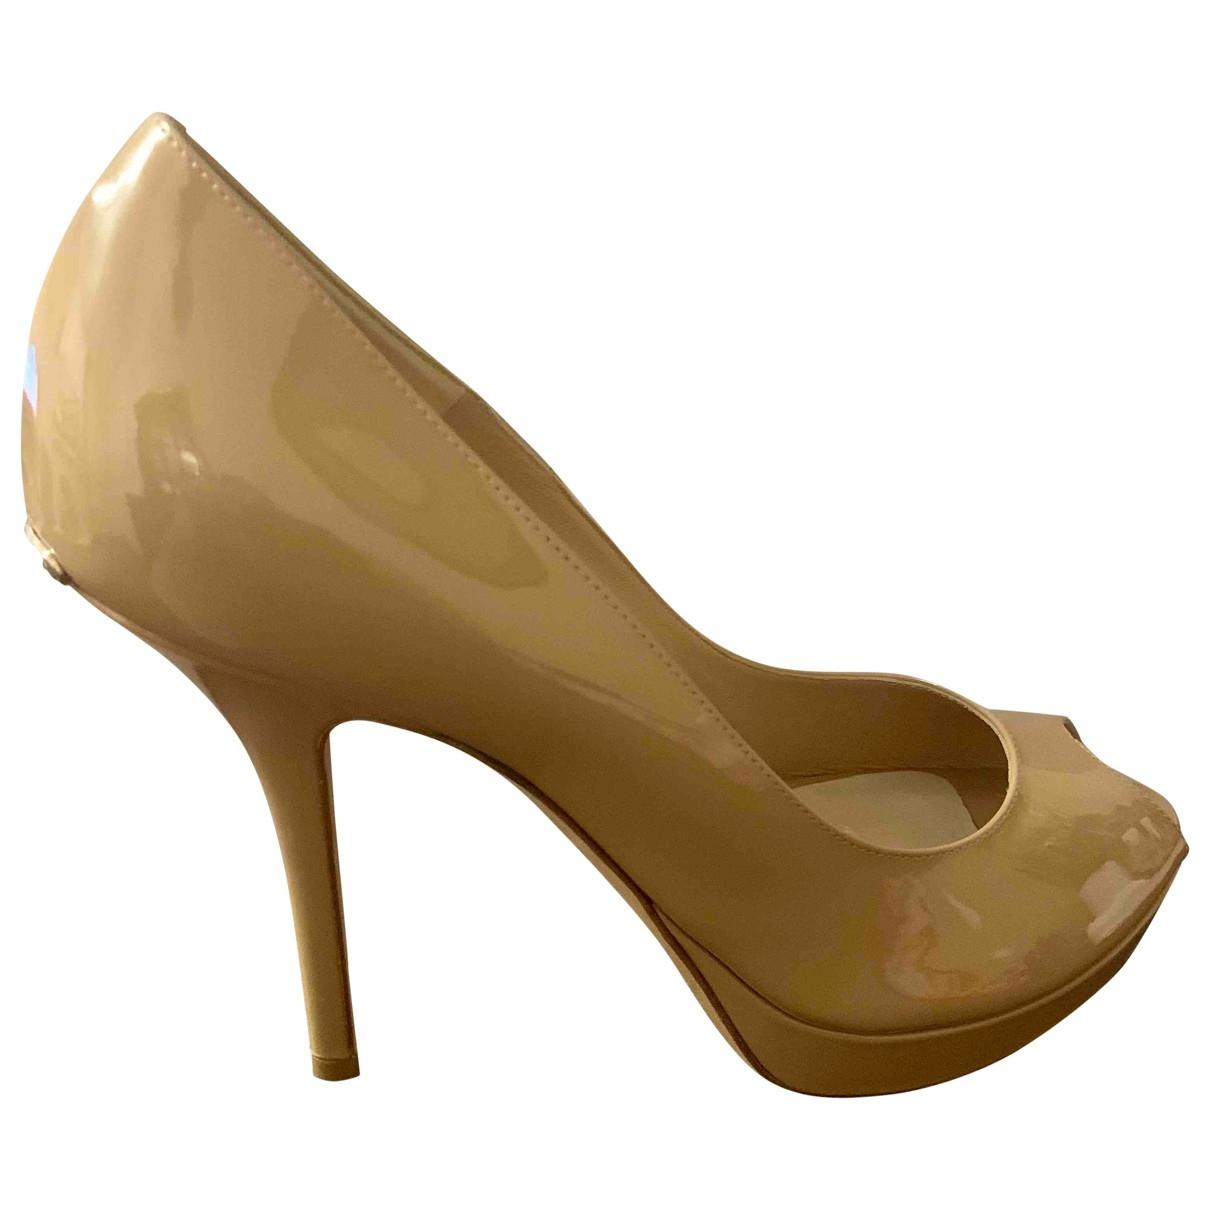 Dior - Escarpins Miss Dior Peep Toes pour femme en cuir verni - beige